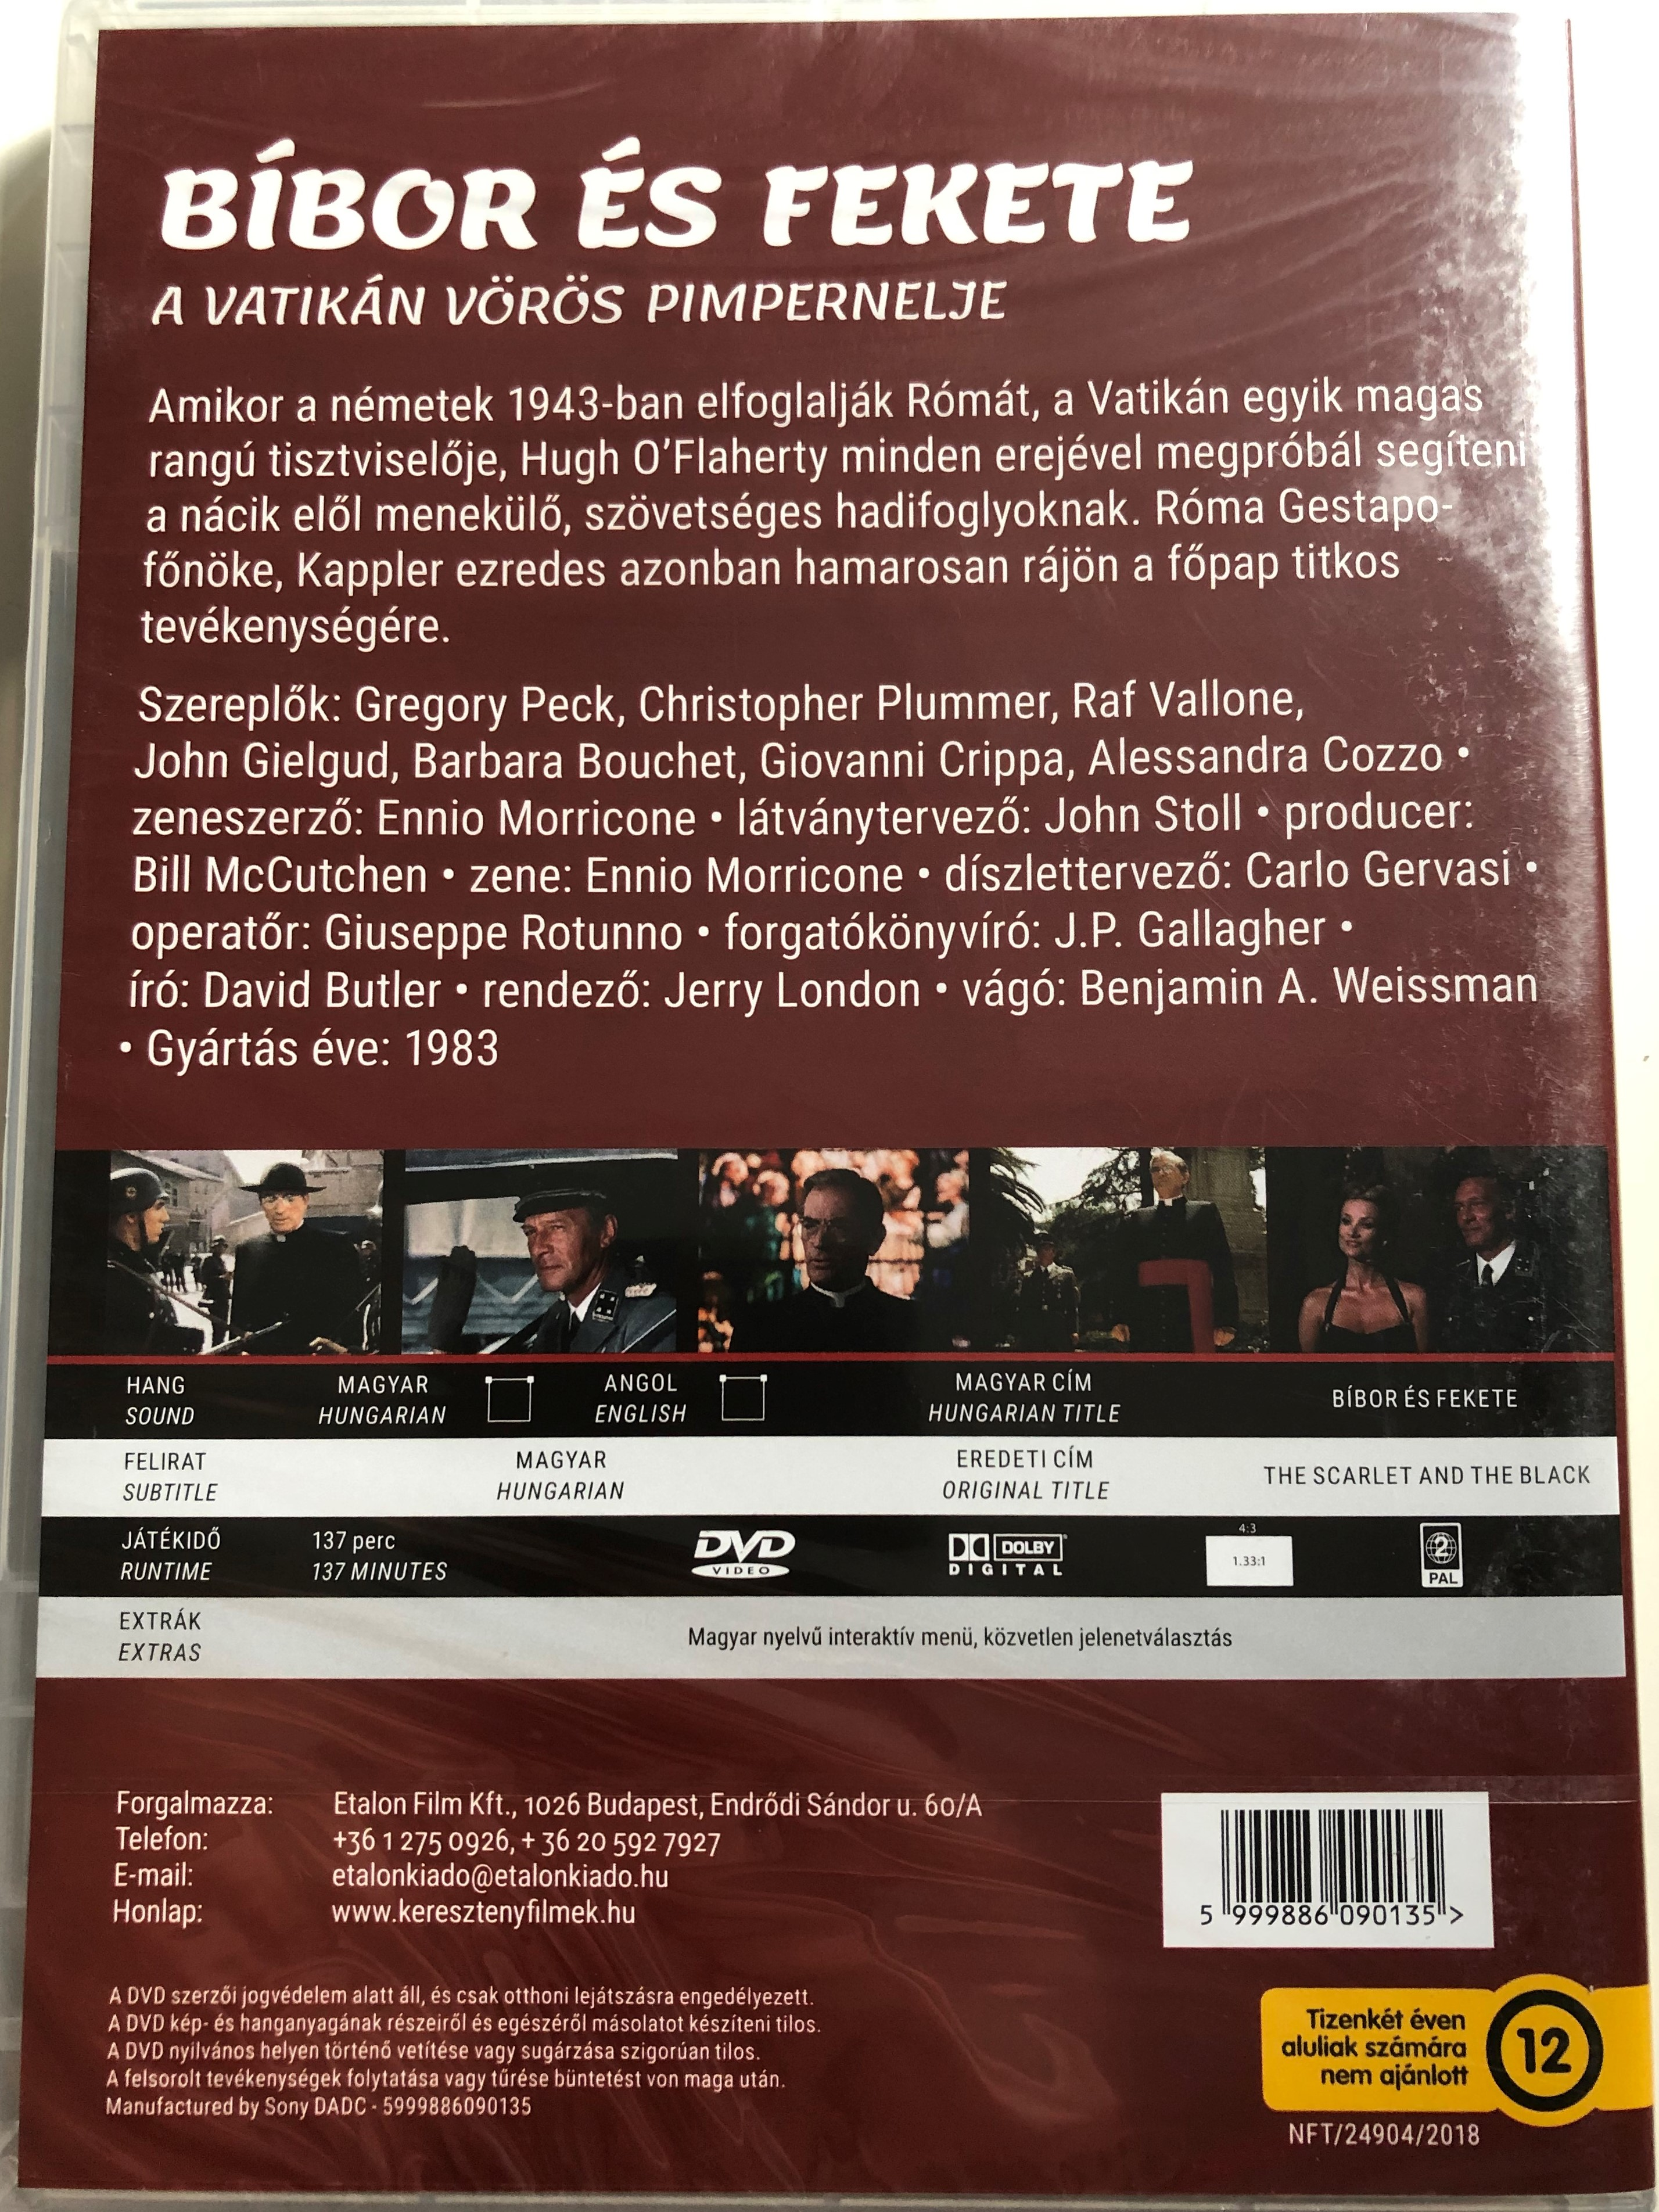 the-scarlet-and-the-black-dvd-1983-b-bor-s-fekete-a-vatik-n-v-r-s-pimpernelje-2.jpg